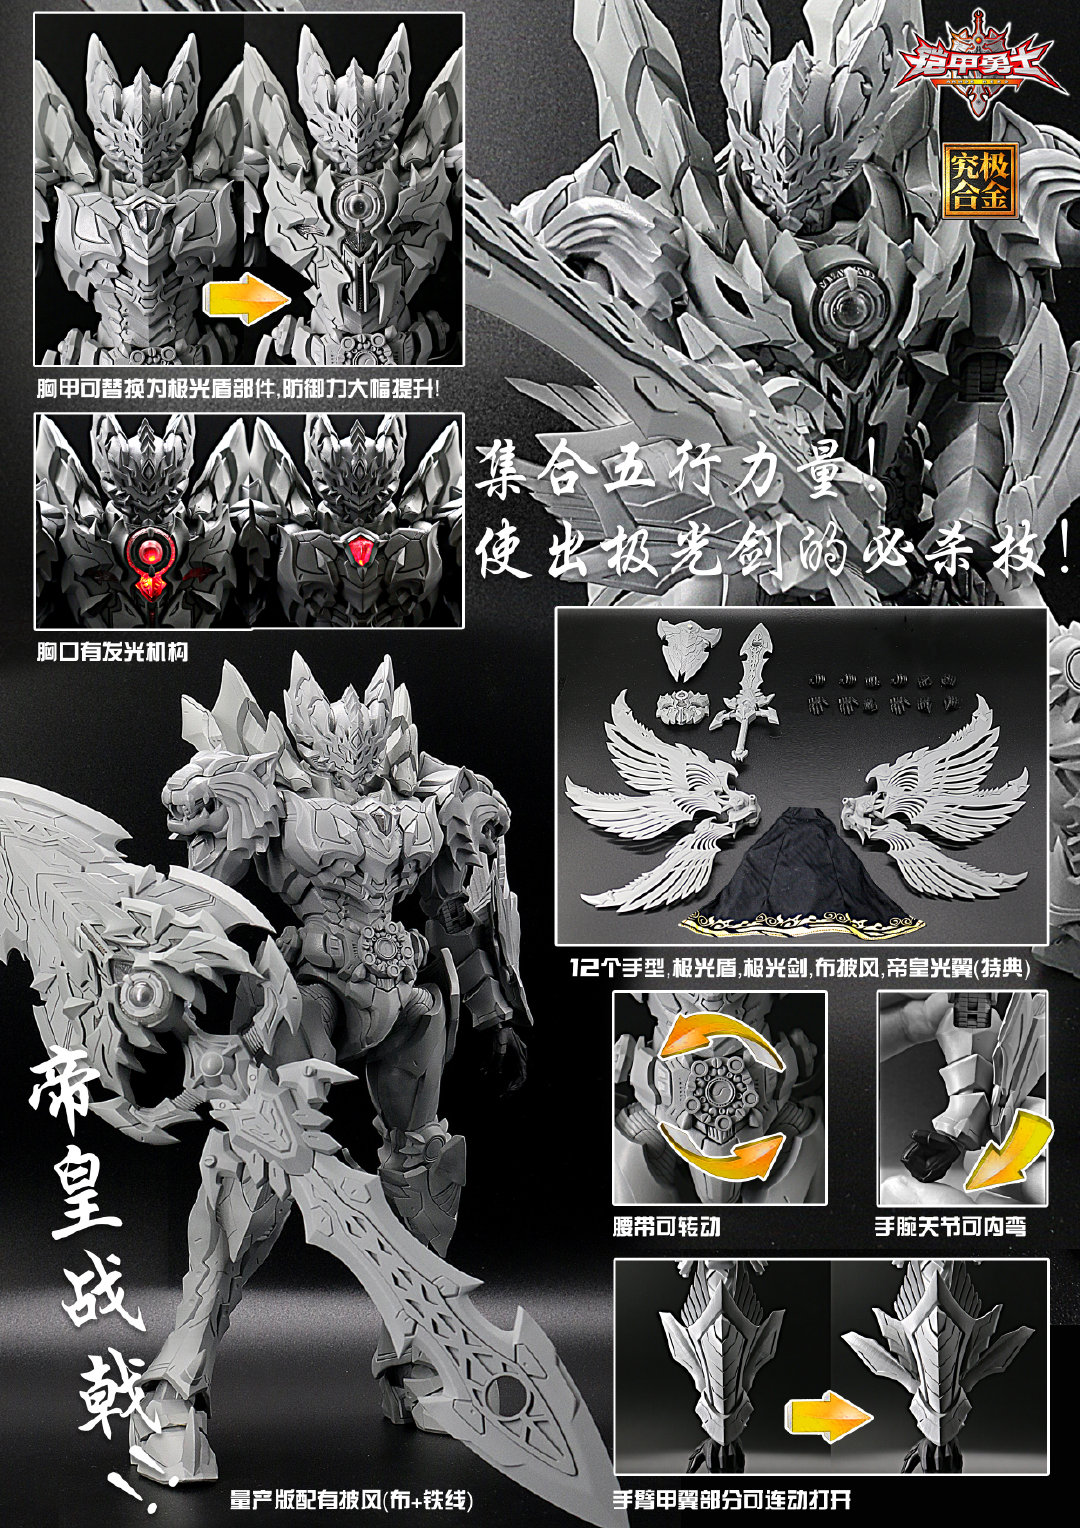 S535_Armor_hero_Emperor_011.jpg